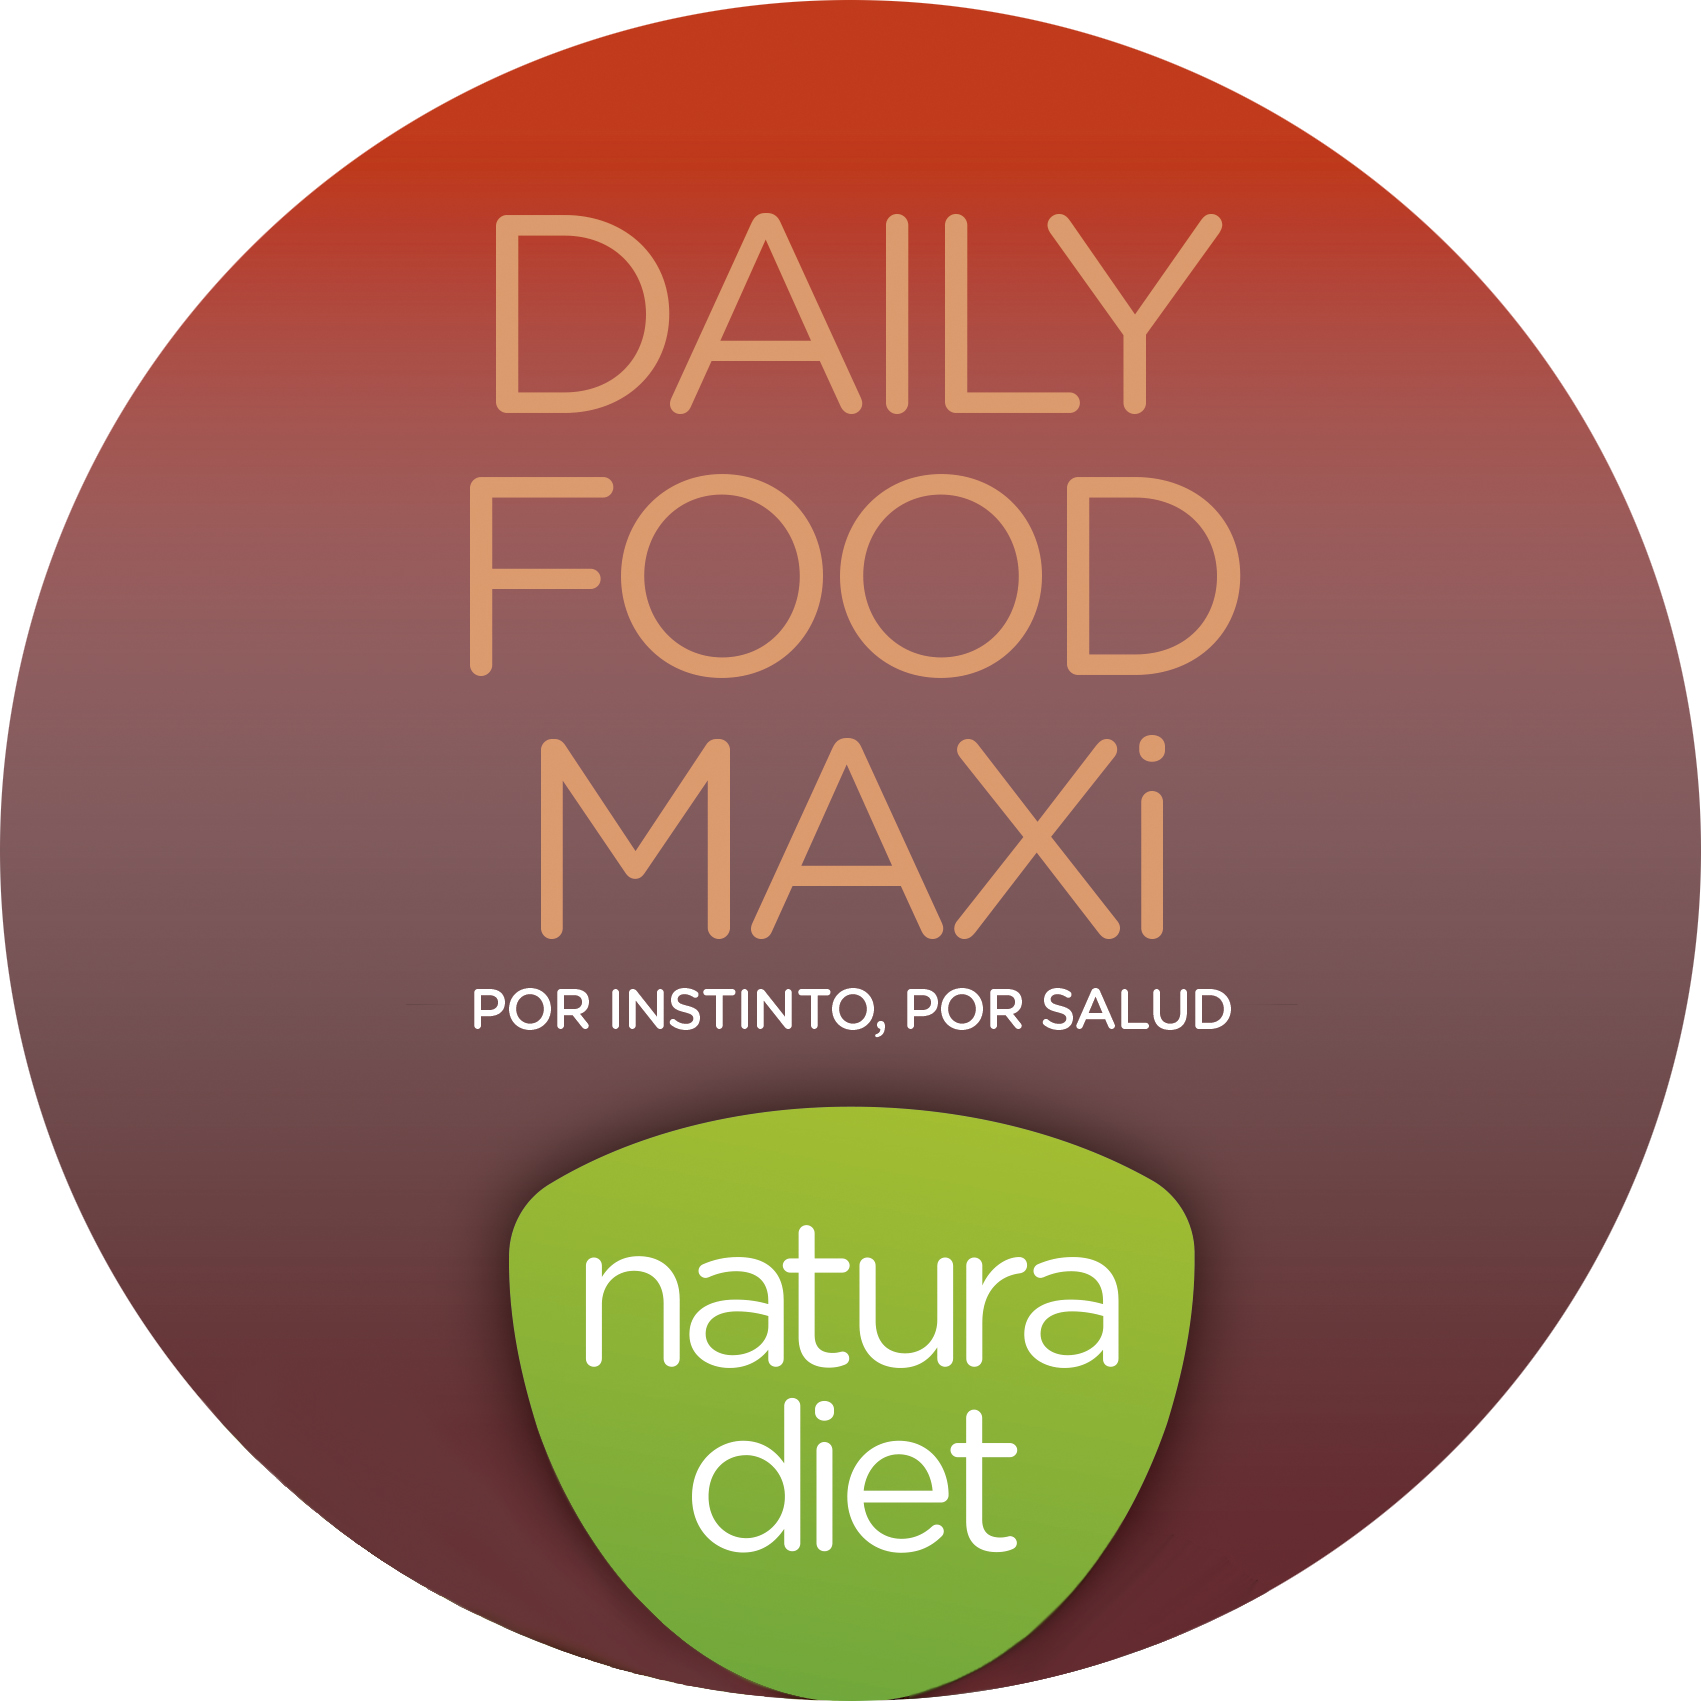 Pienso_Natura_Diet_Daily_Food_Maxi_Logo